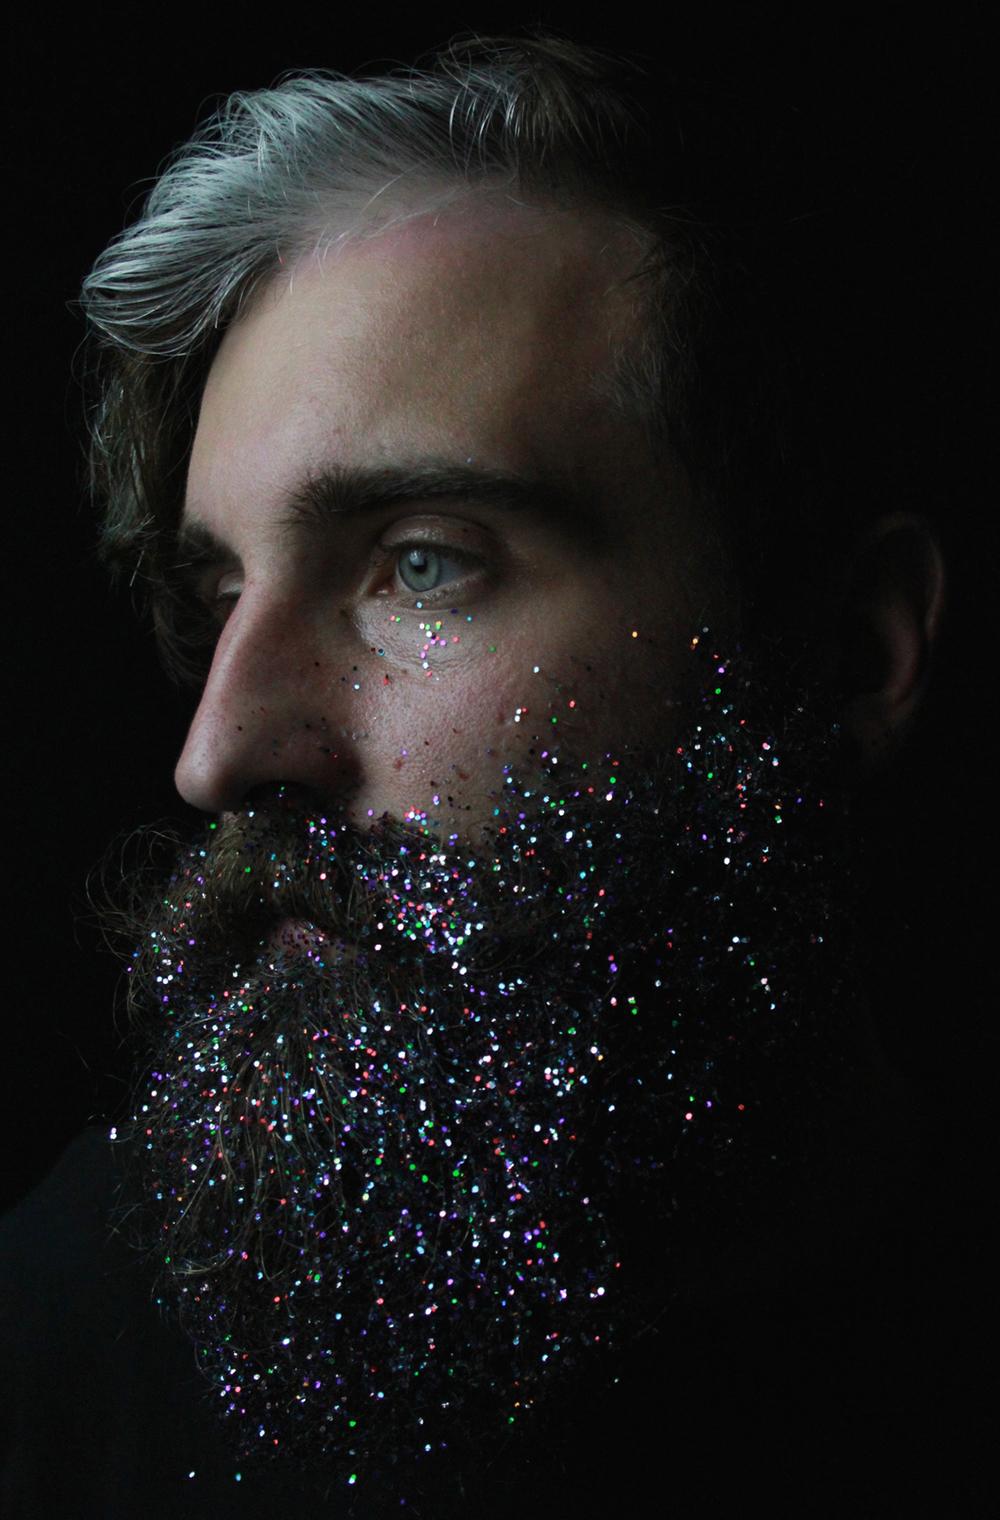 amici-decorano-loro-barbe-the-gay-beards-06